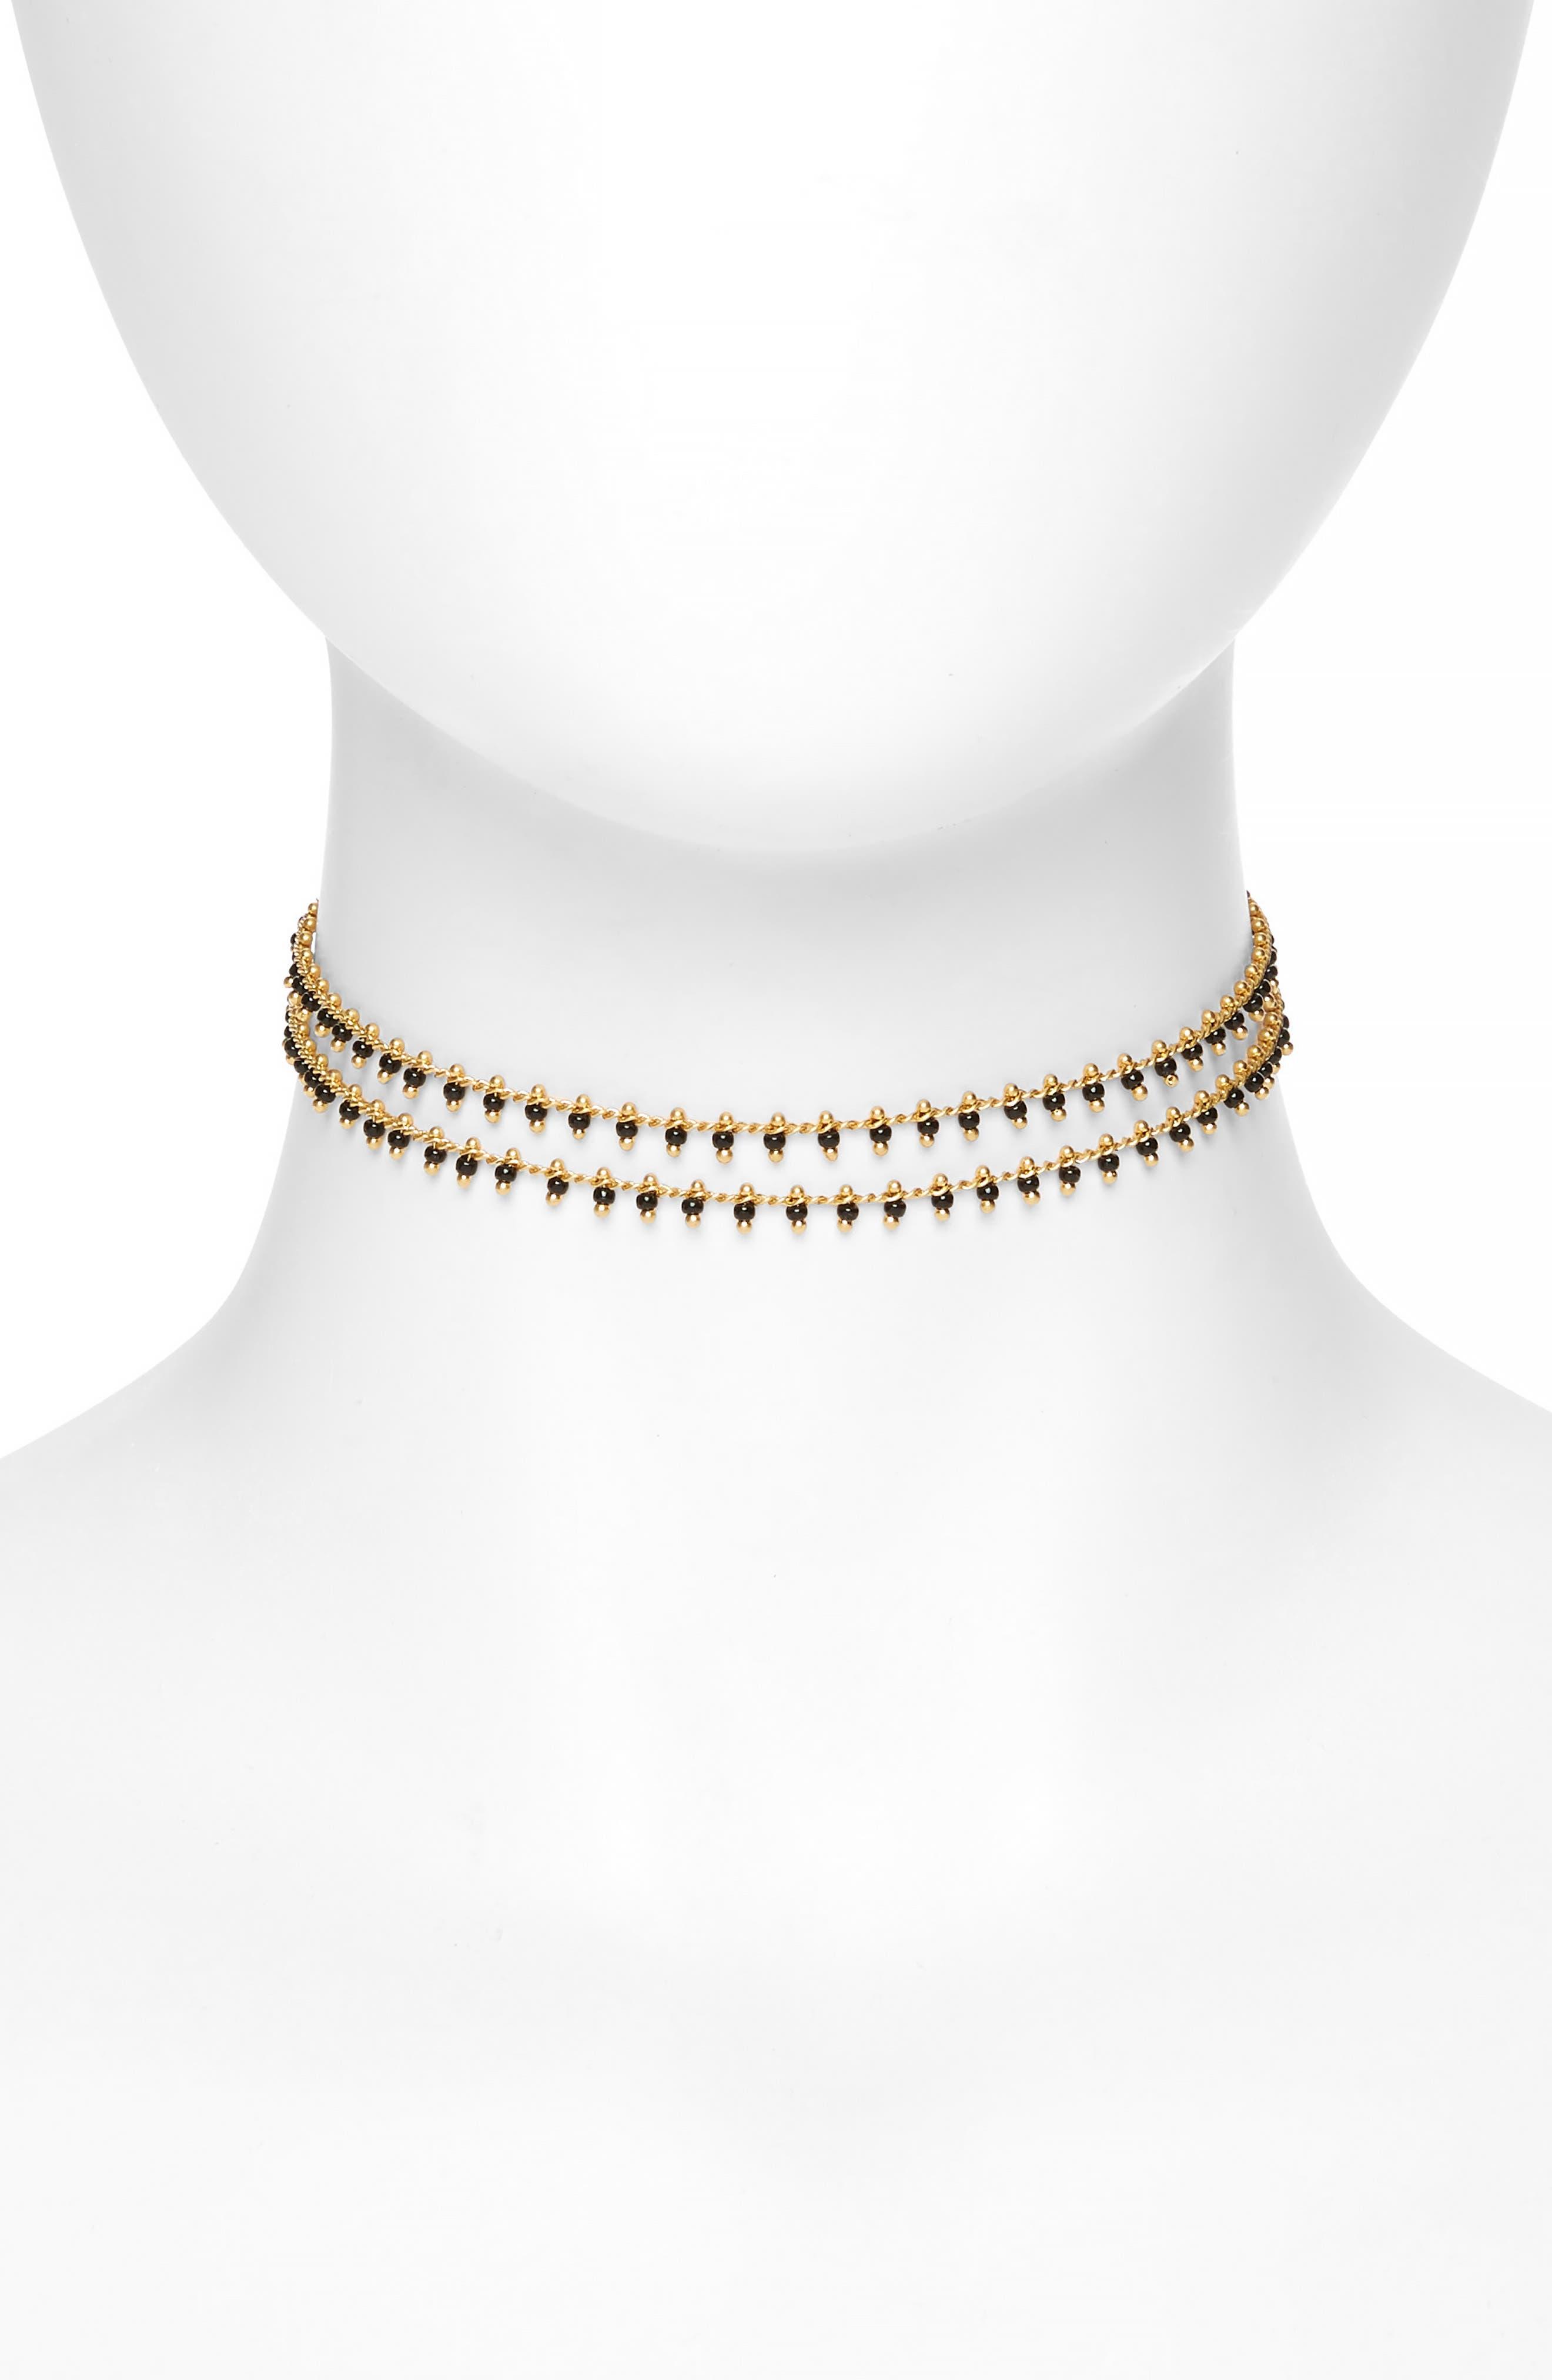 Beadlink Choker Necklace,                         Main,                         color,